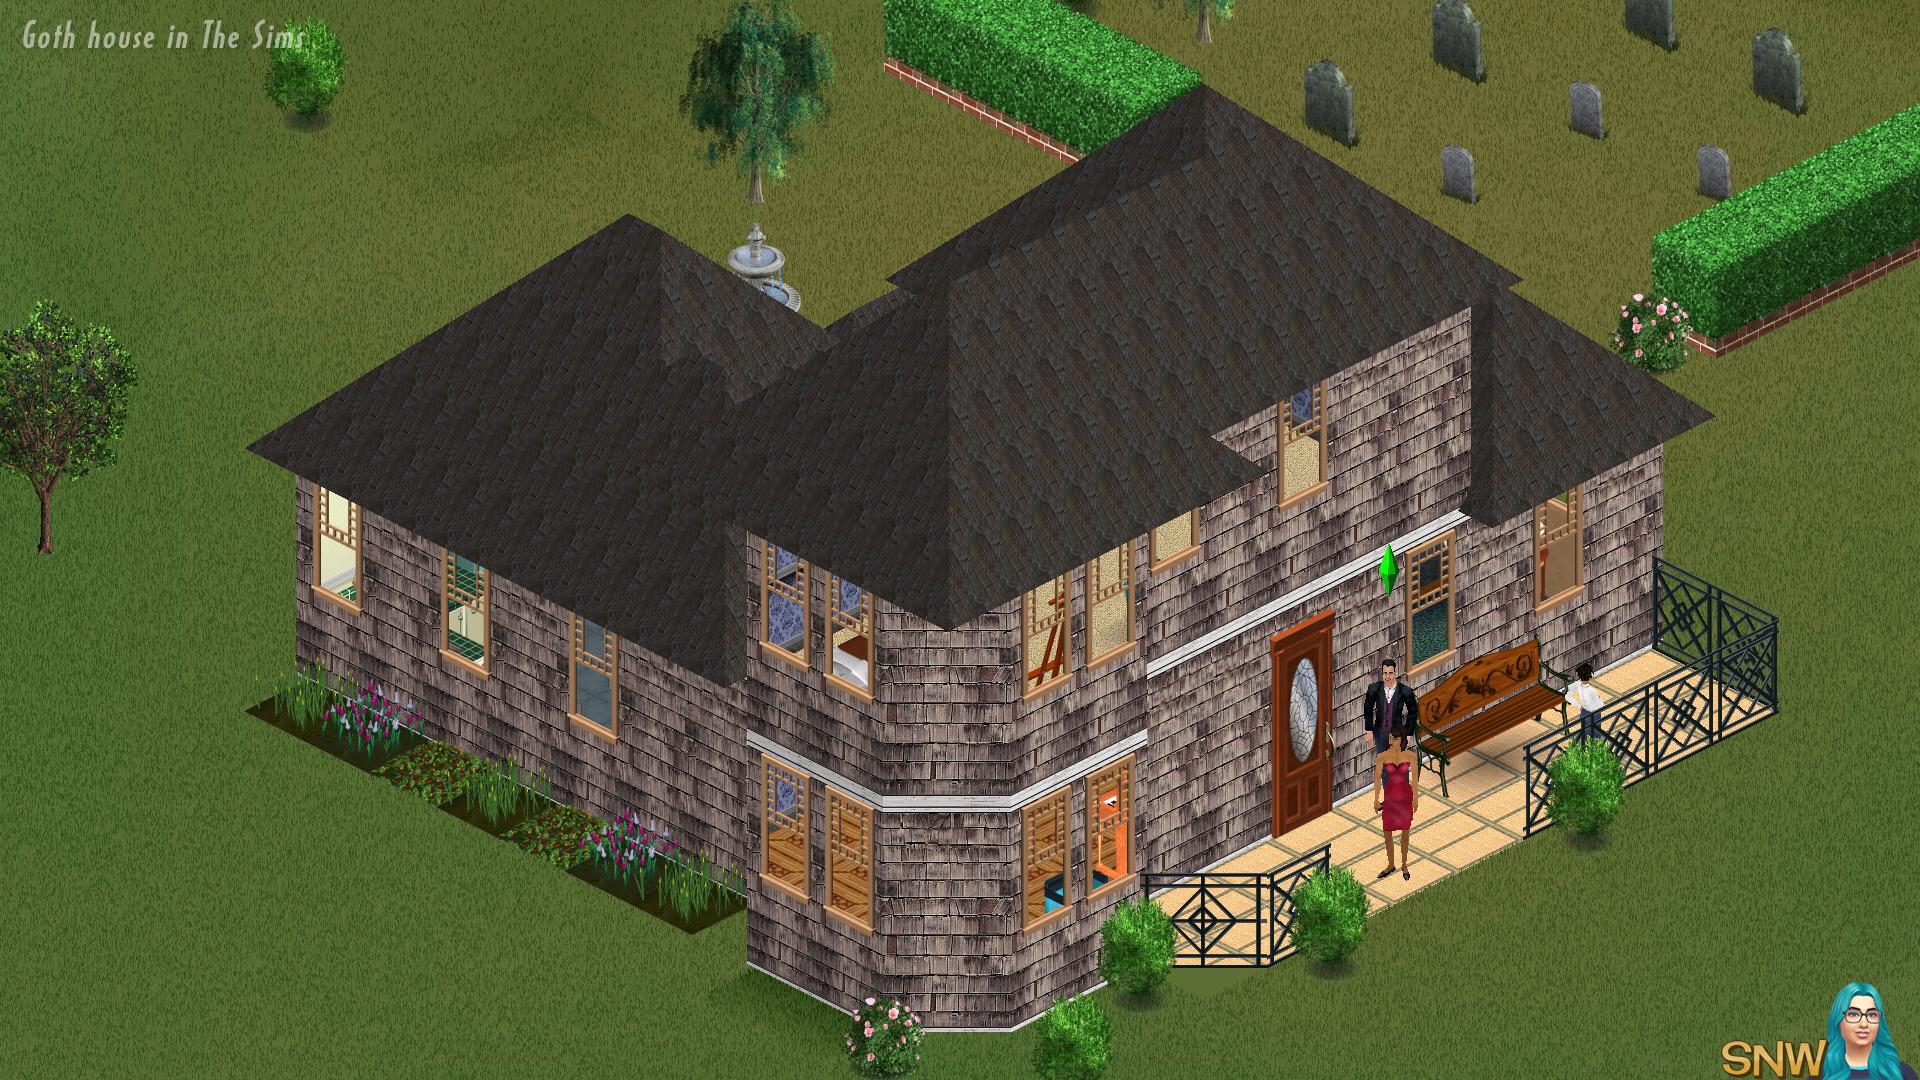 Goth House